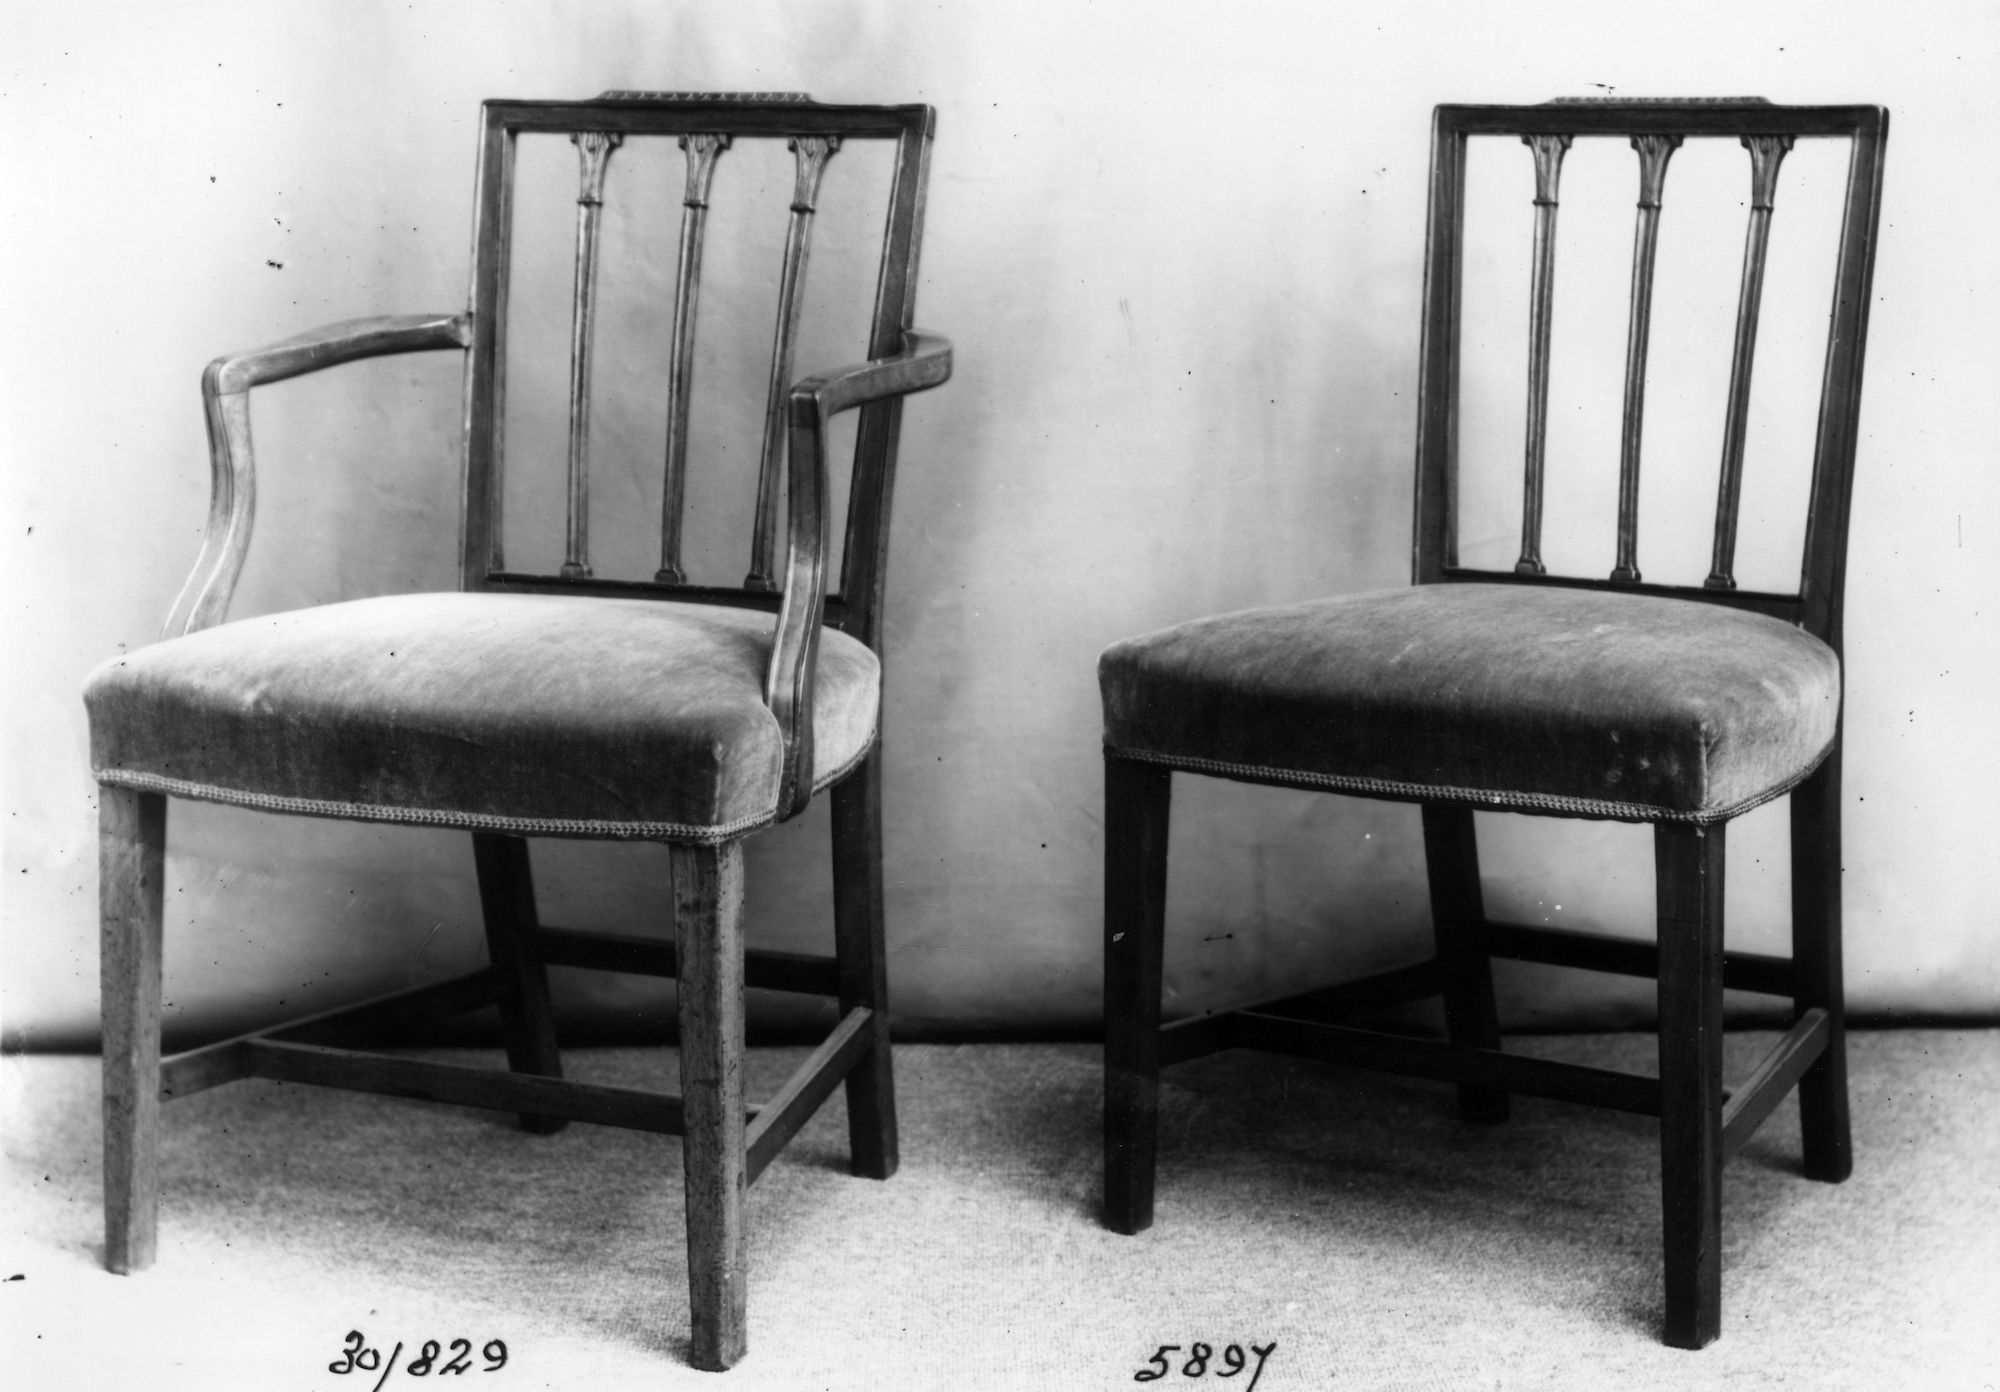 Sheraton chairs